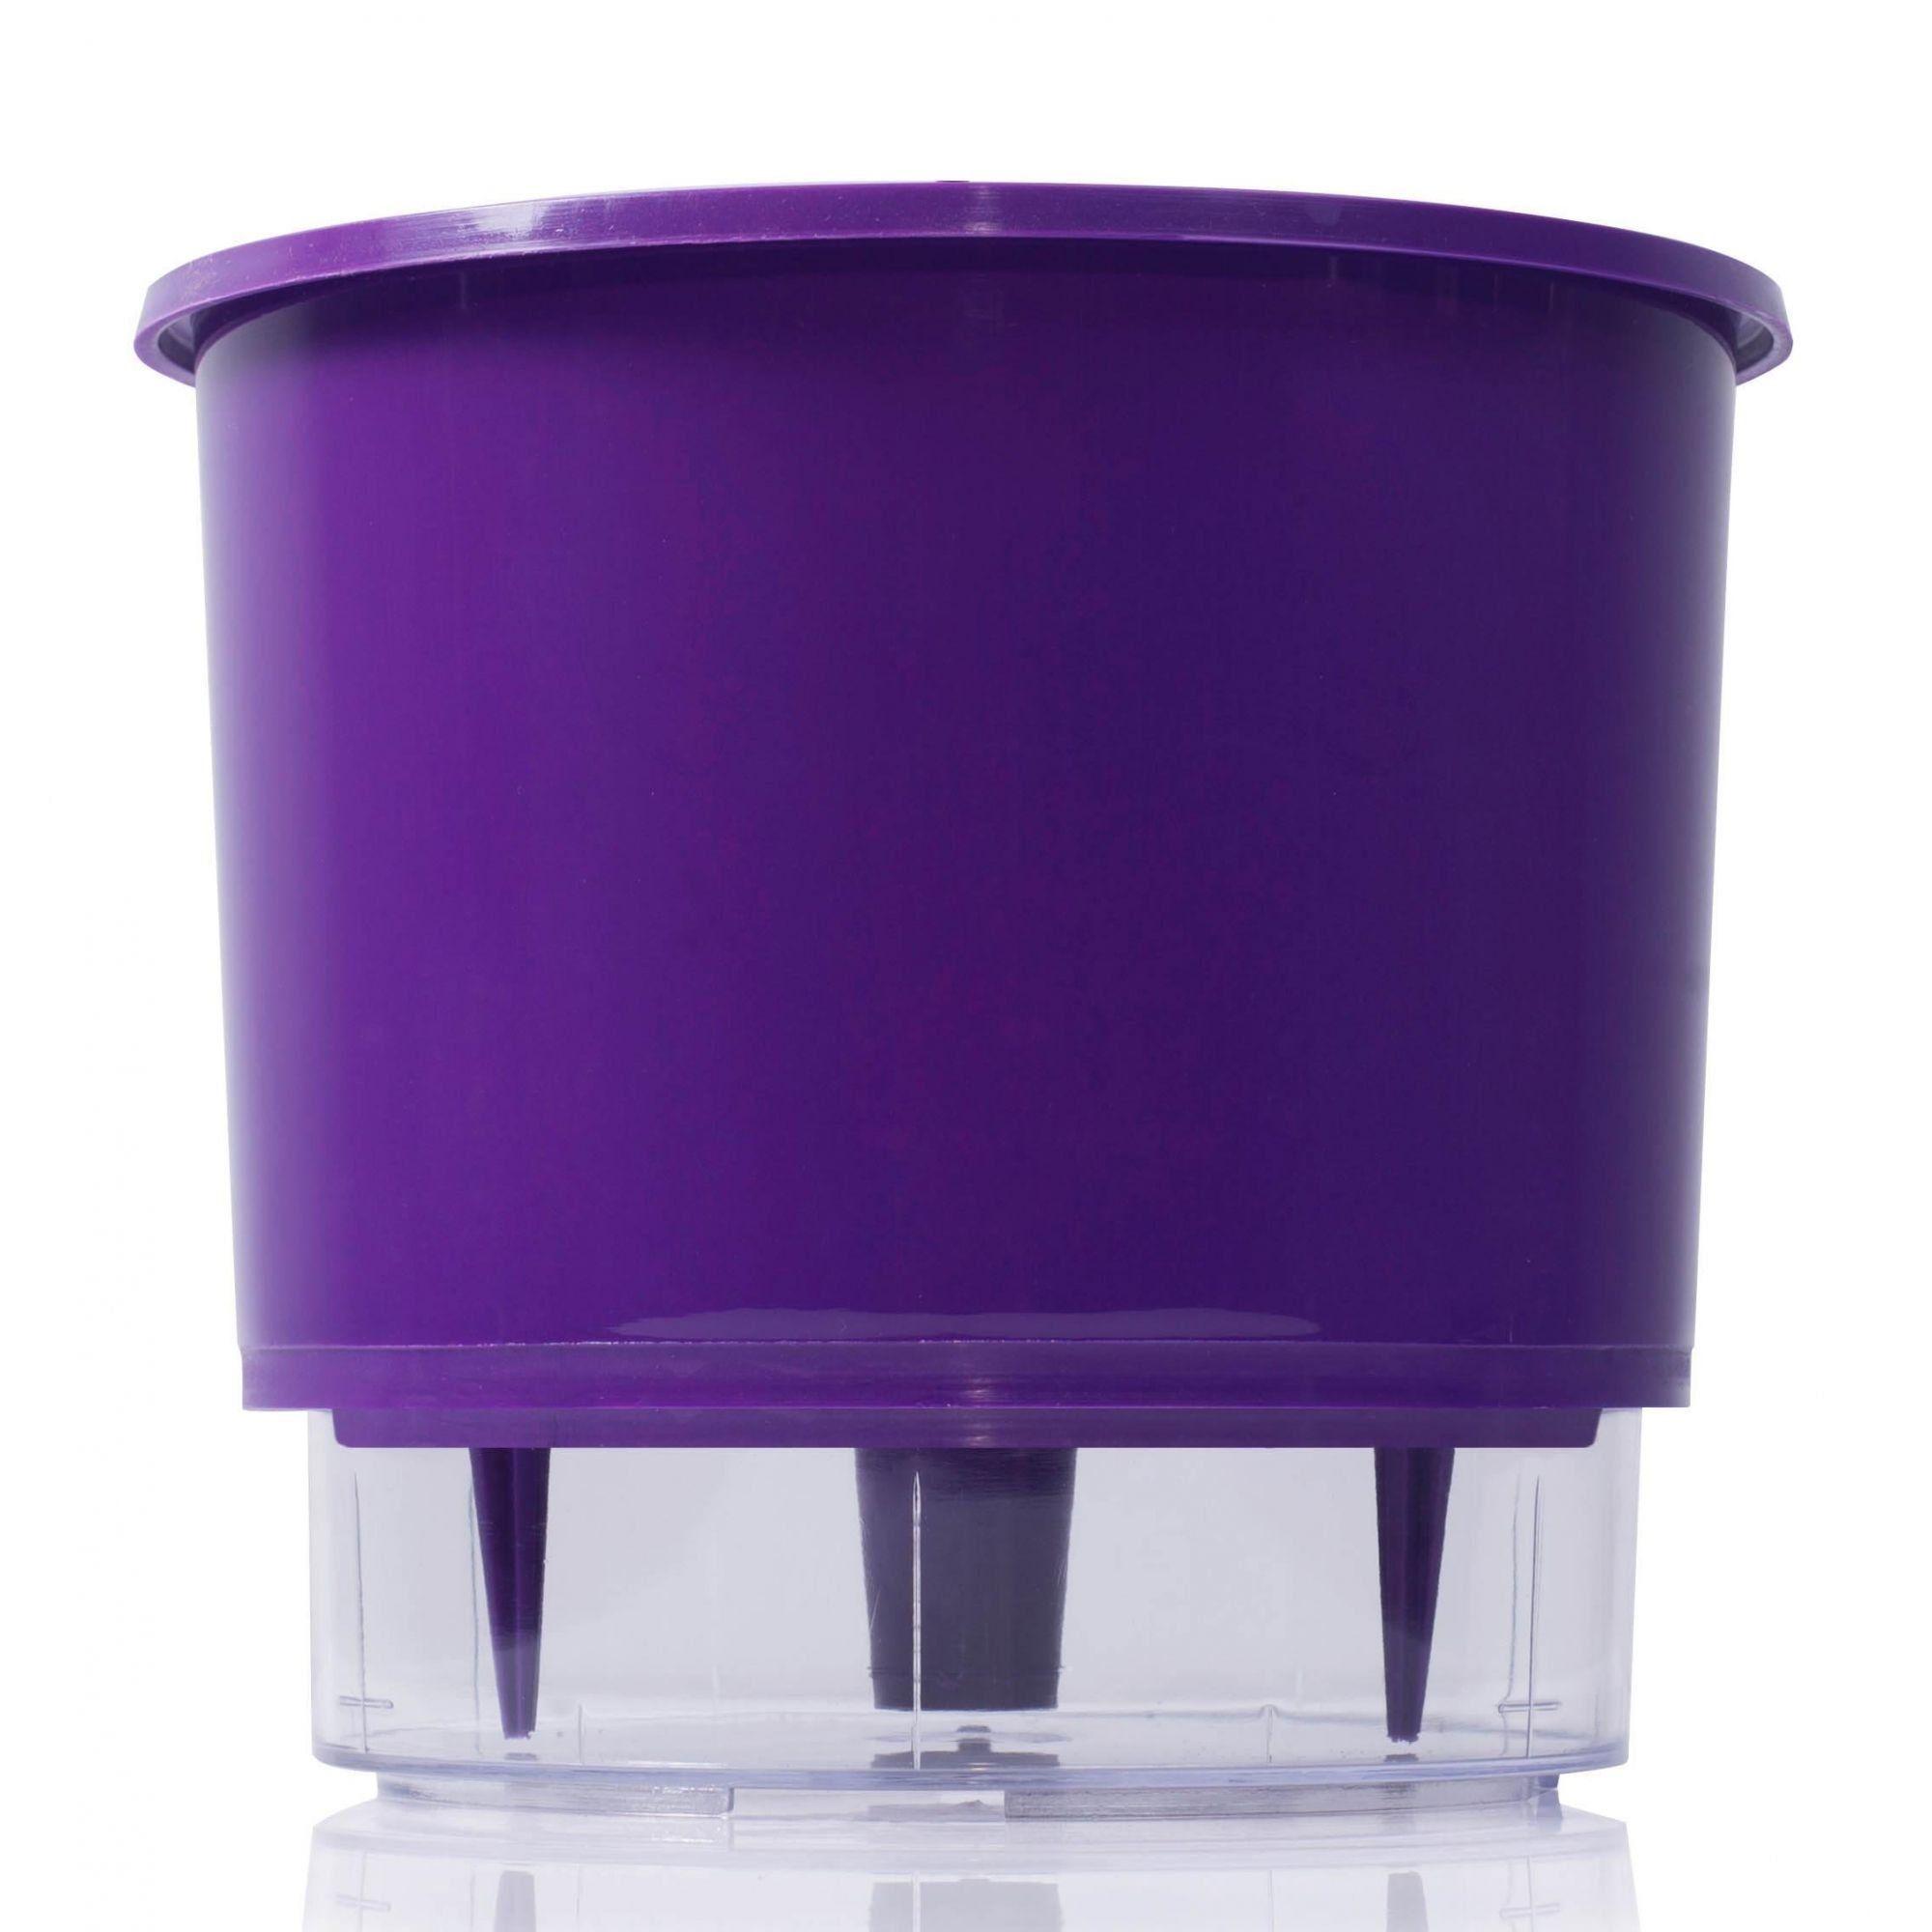 Vaso autoirrigável Raiz MÉDIO N03 16 cm X 14 cm